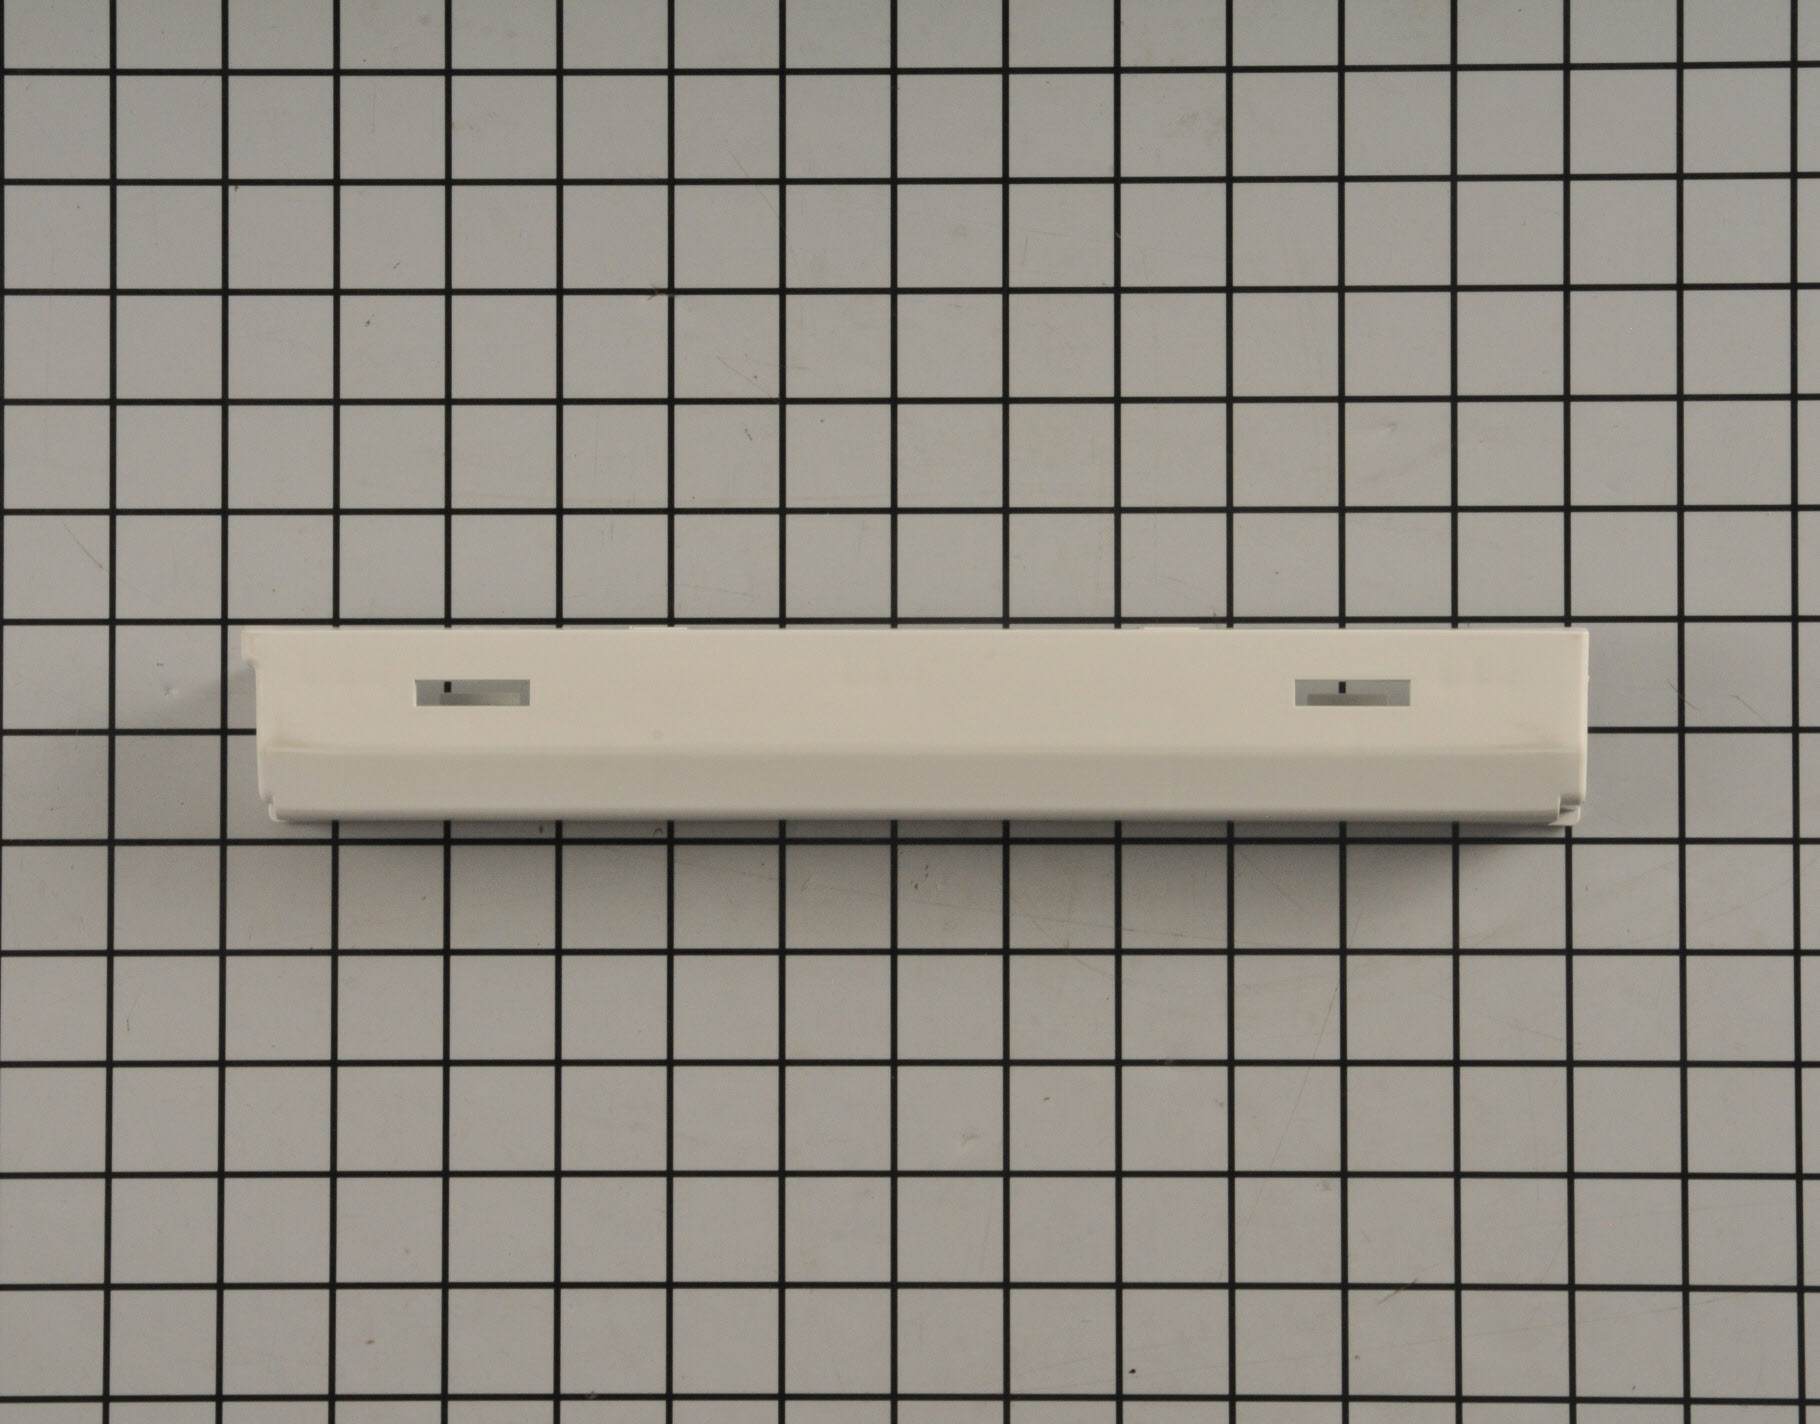 Maytag Refrigerator Part # W10826790 - Support